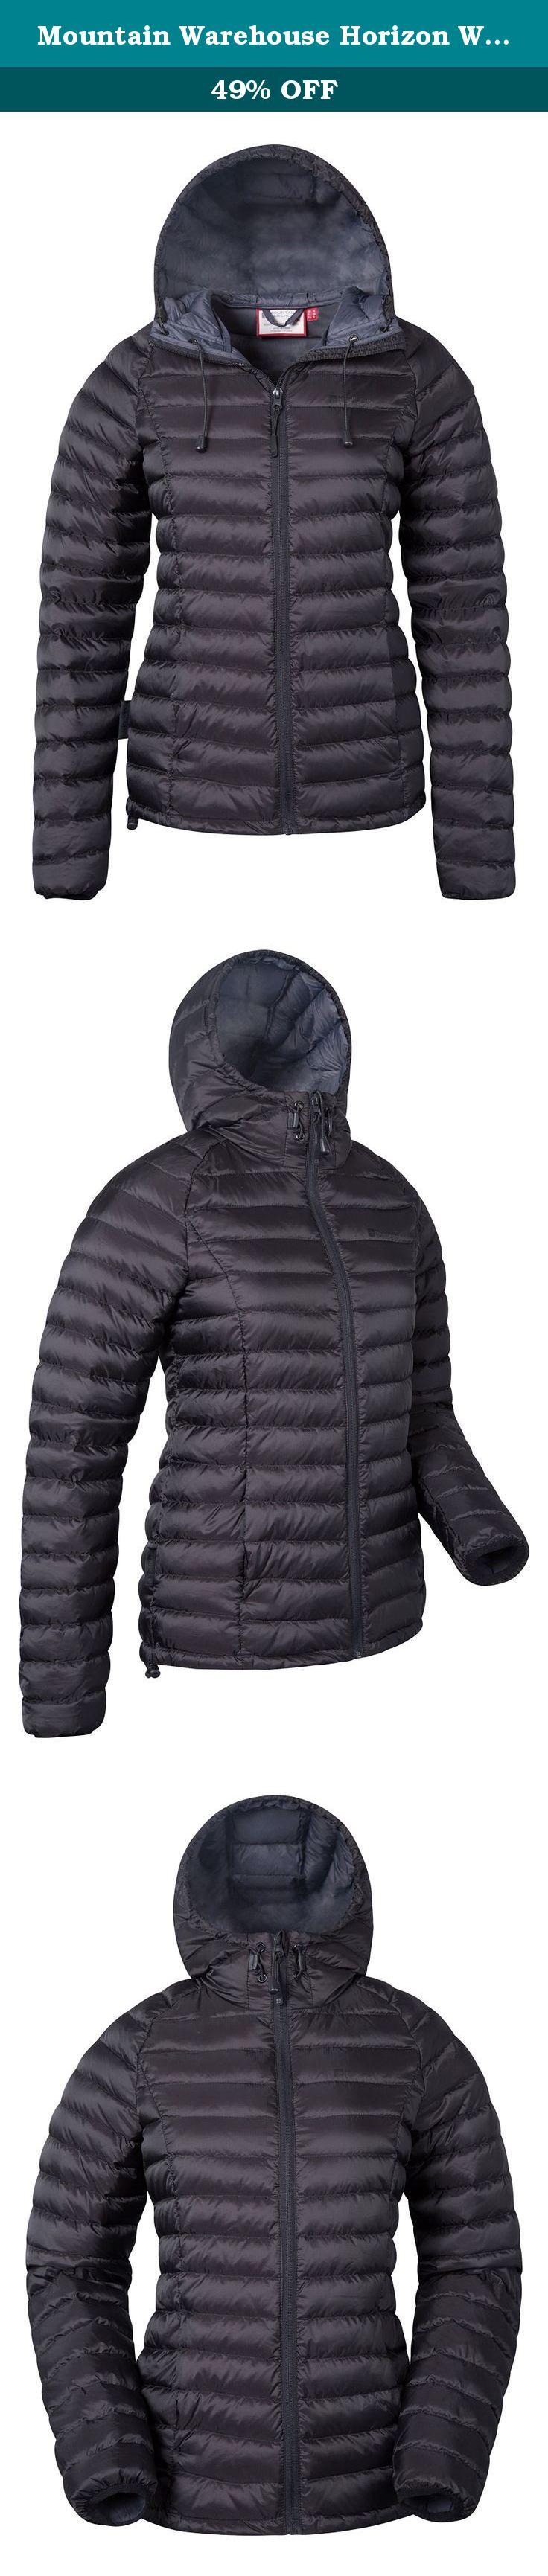 Mountain Warehouse Horizon Womens Hydrophobic Down Jacket Black 14 The Horizon Womens Hydrophobic Down Jacket Is Jackets Water Resistant Fabric Winter Jackets [ 3462 x 736 Pixel ]